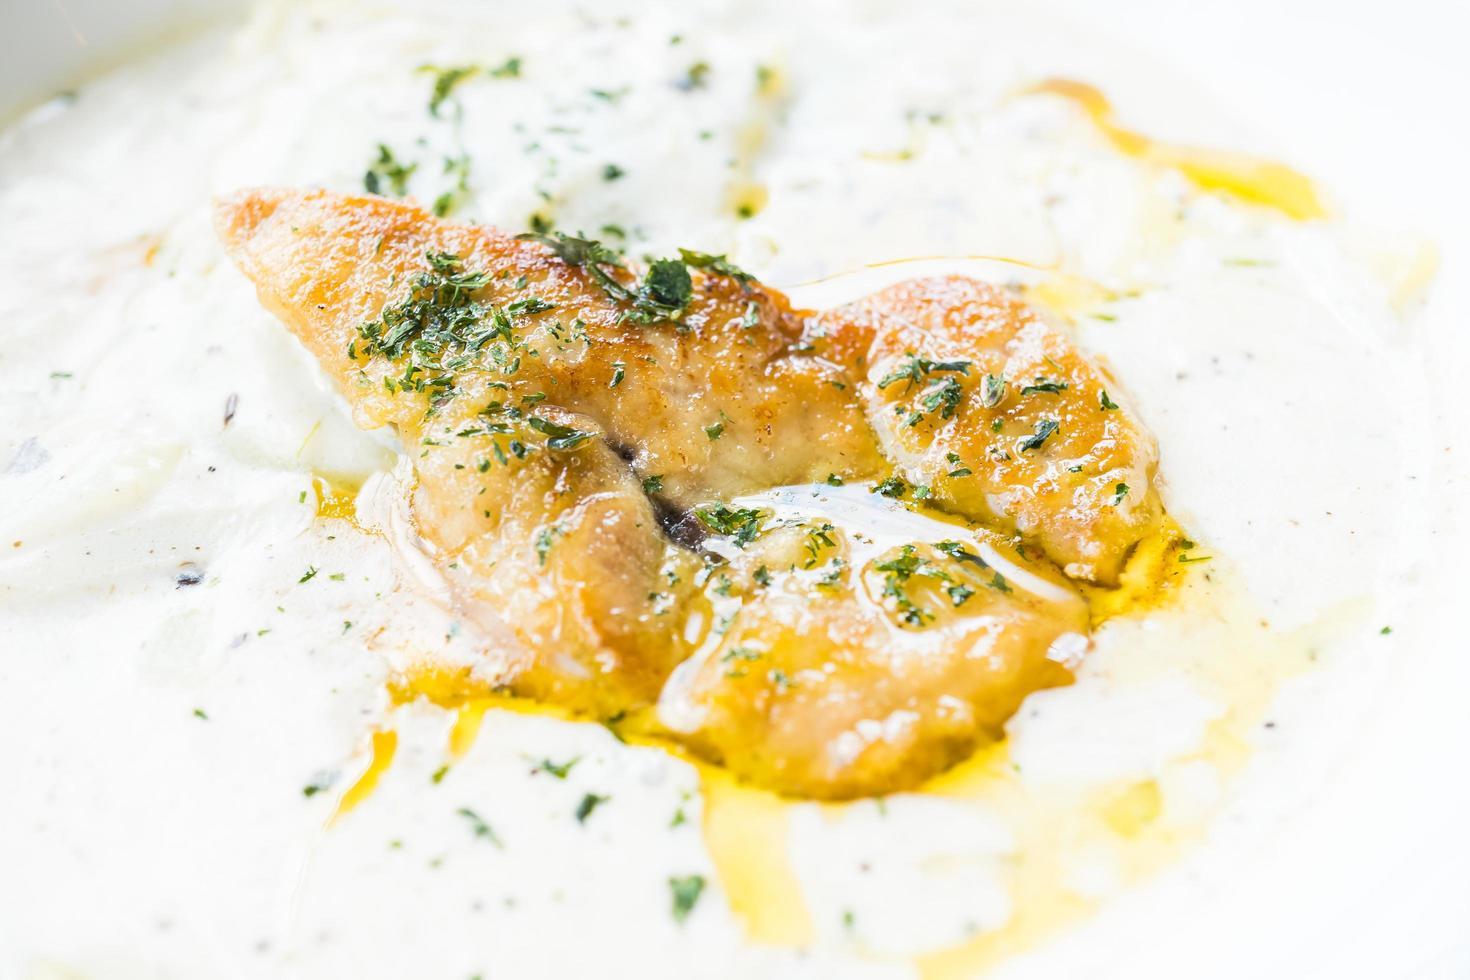 foie gras con salsa de crema penne foto